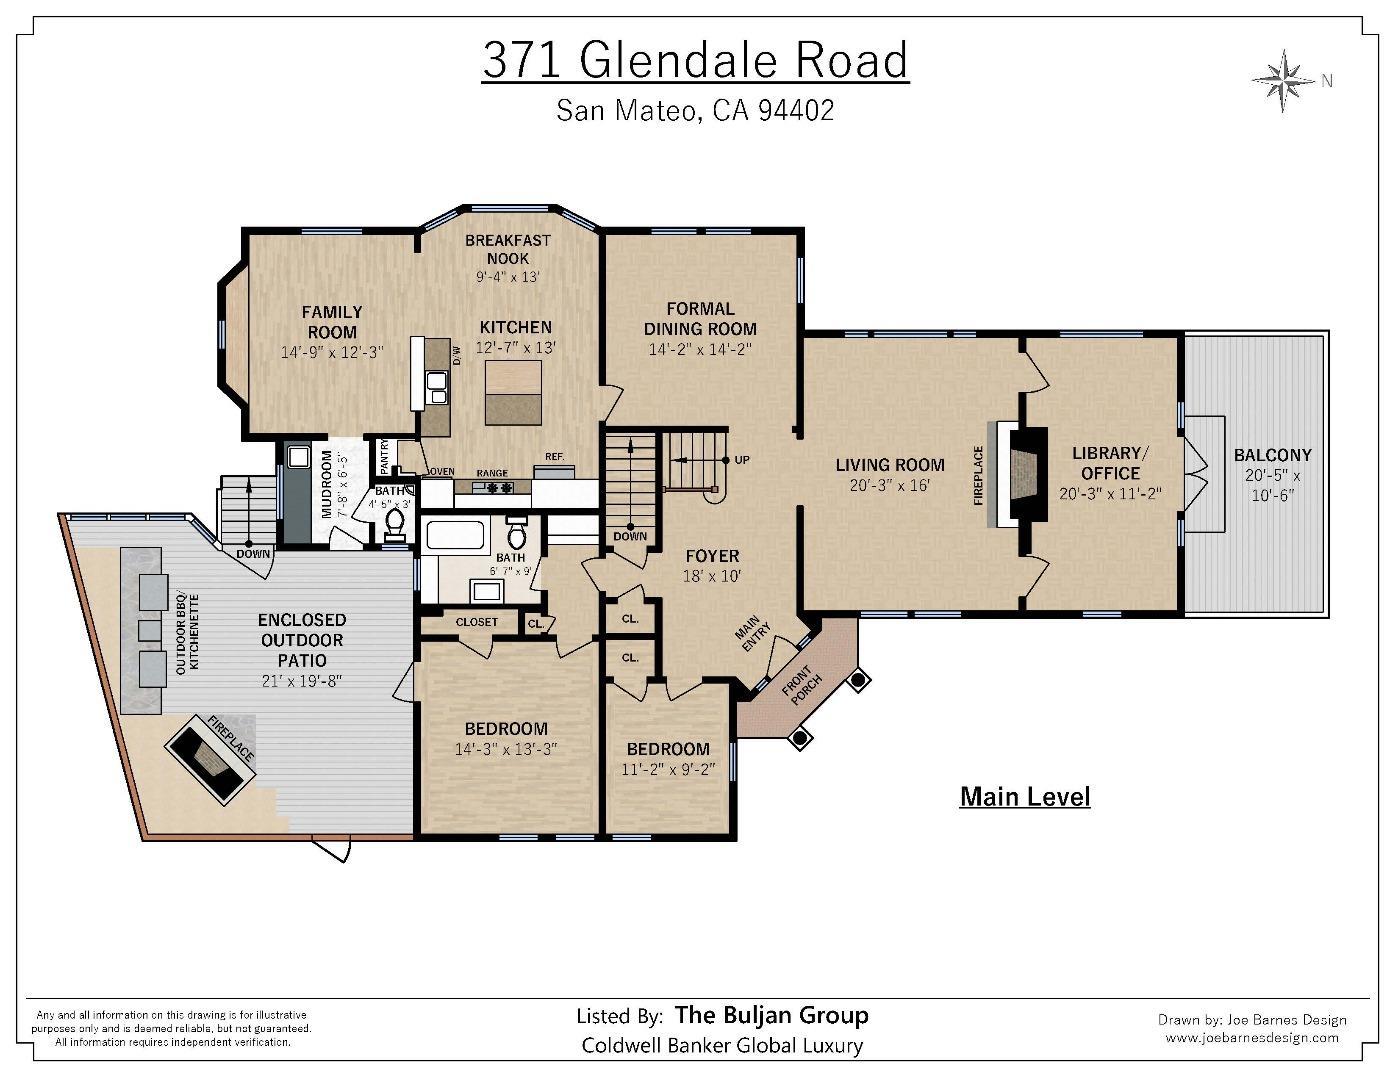 371 GLENDALE RD, SAN MATEO, CA 94402  Photo